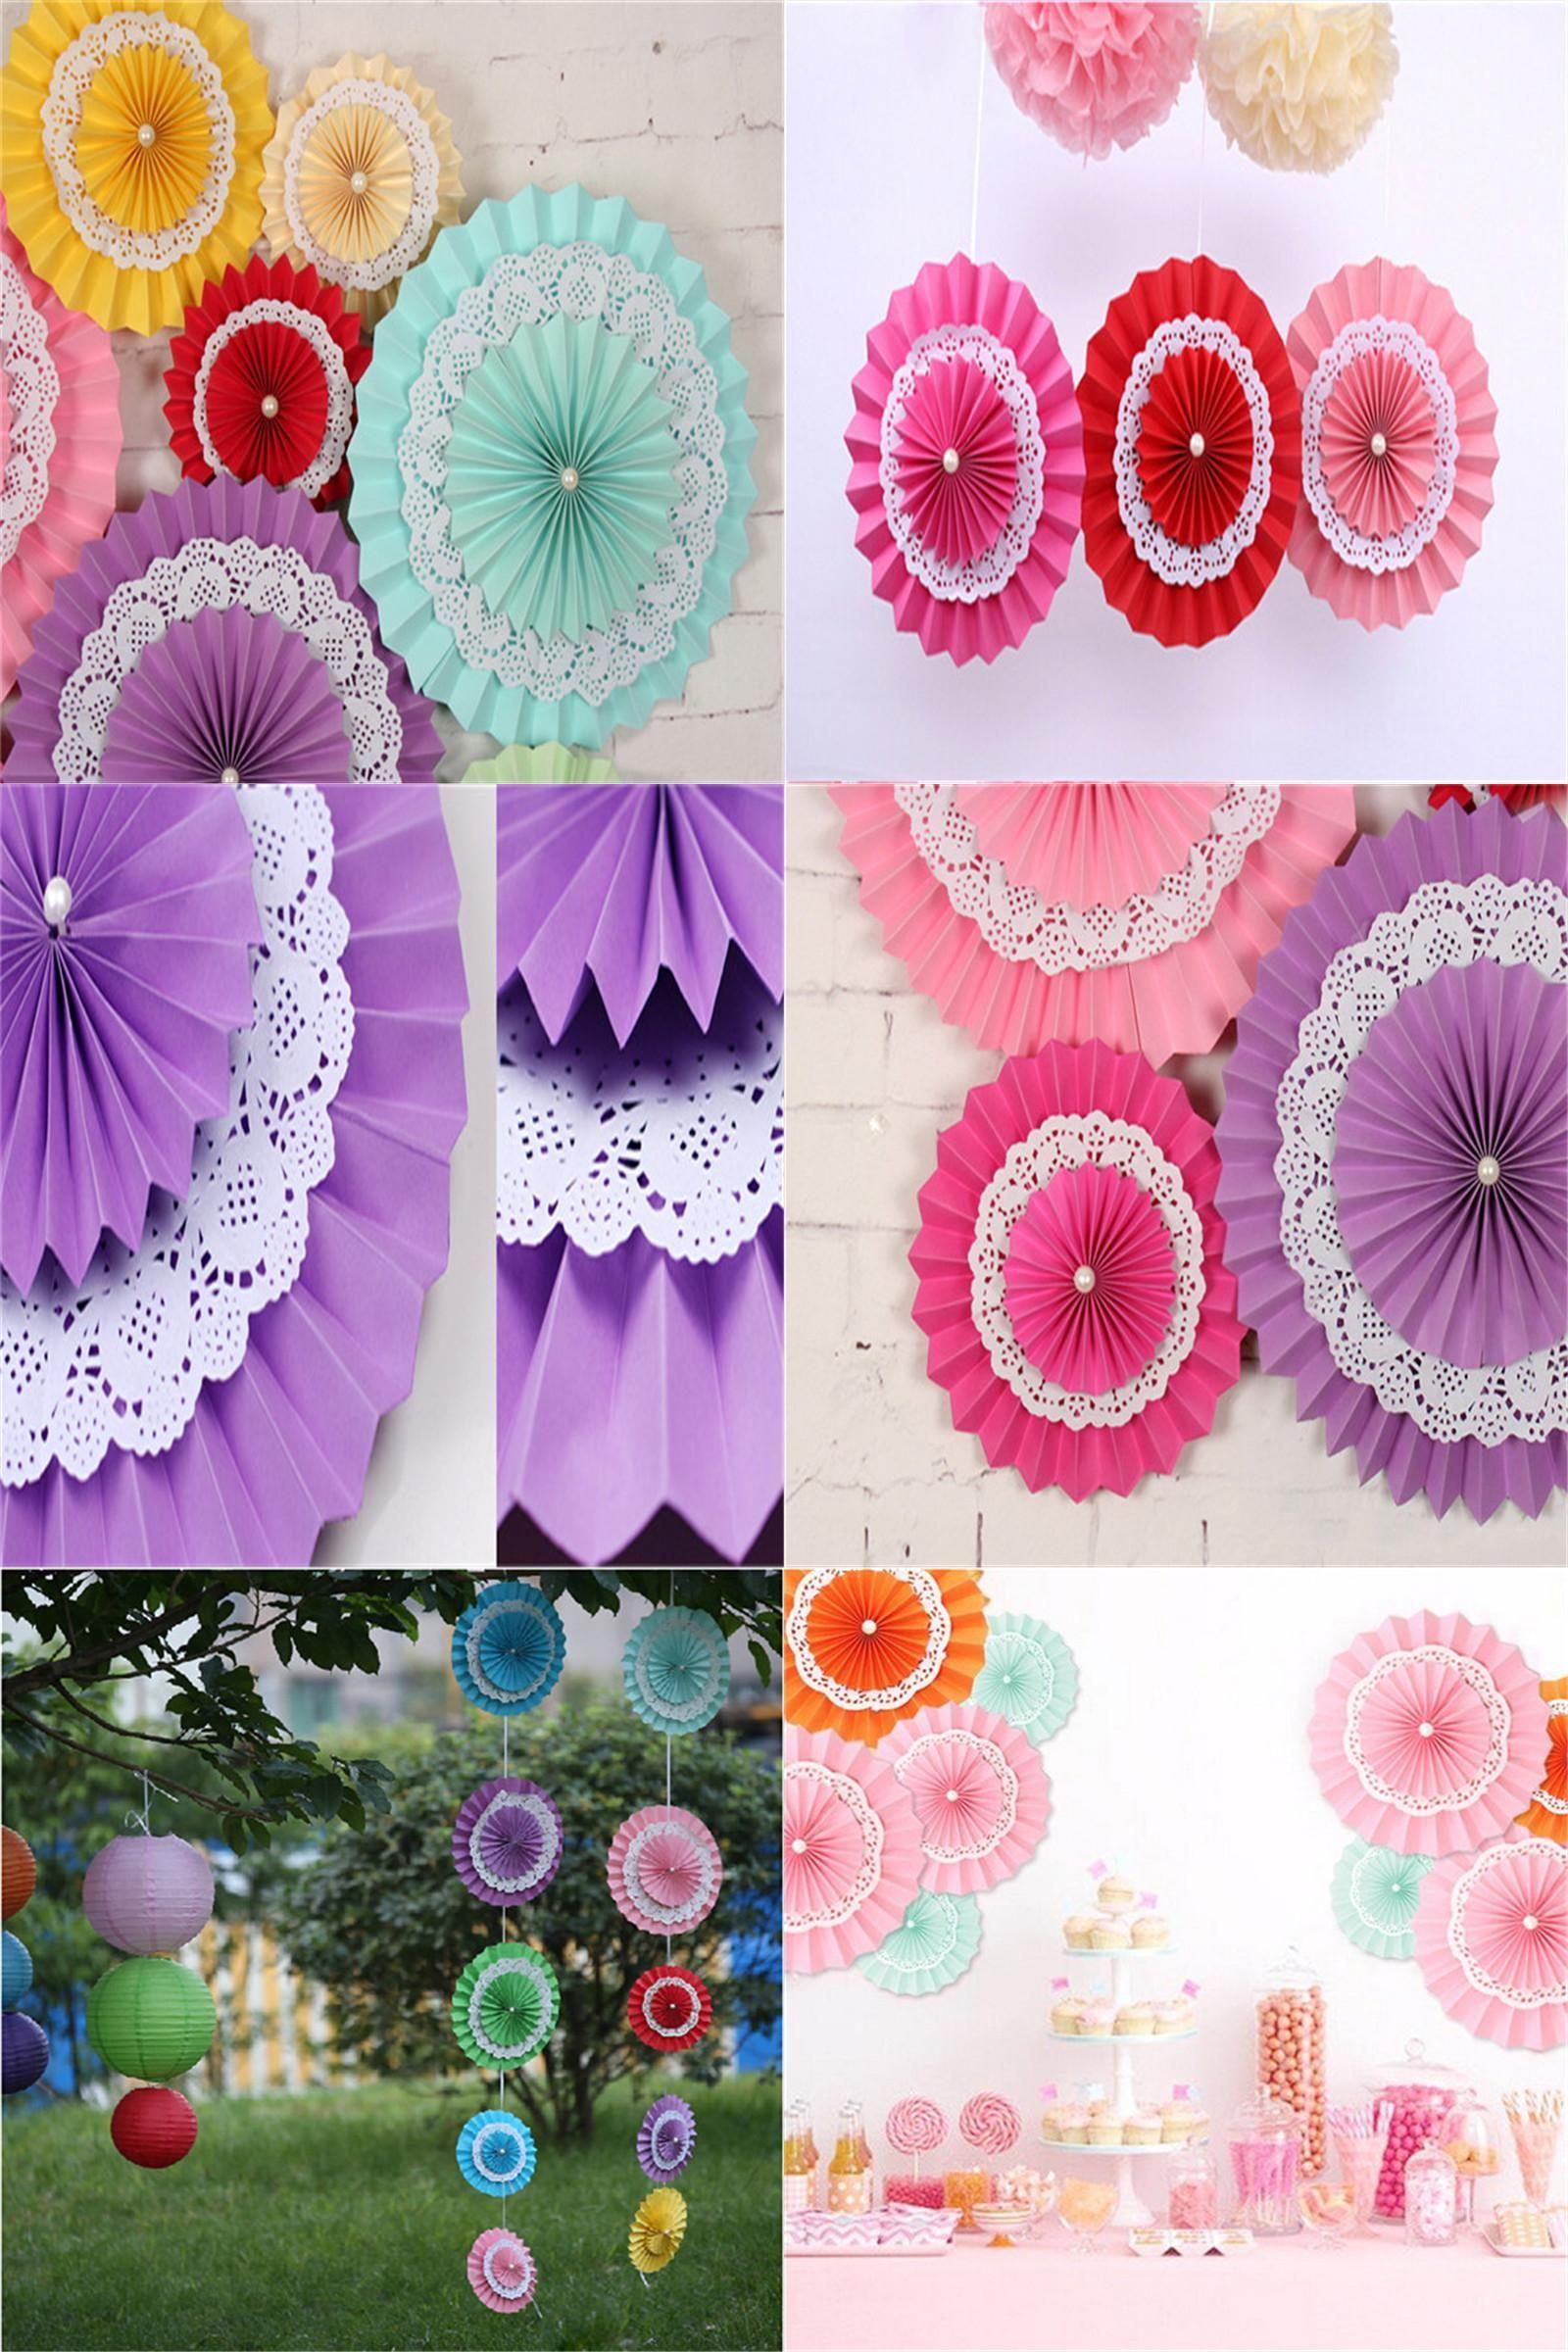 Visit To Buy 1pcs 15cm Paper Fan Decorative Flowers Birthday